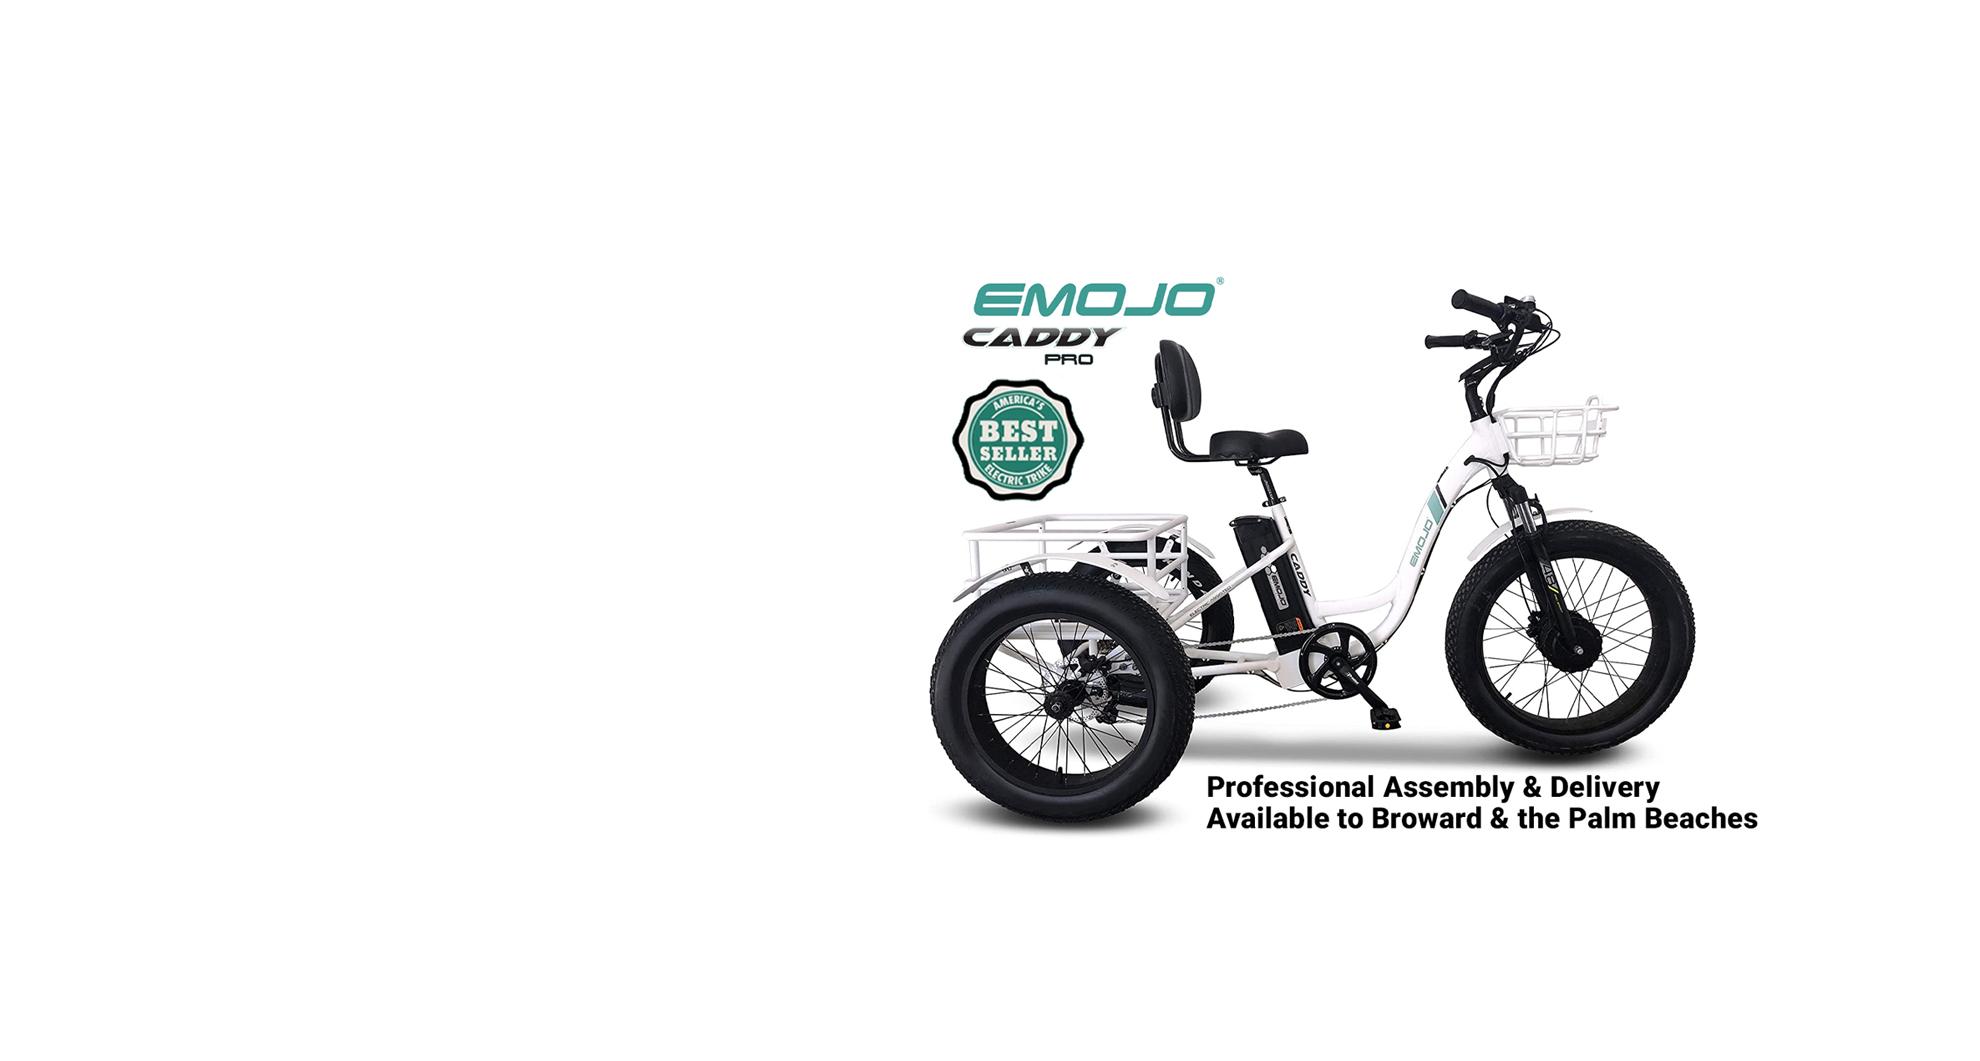 electic-plus-bikes-emojo-caddy-23jpg